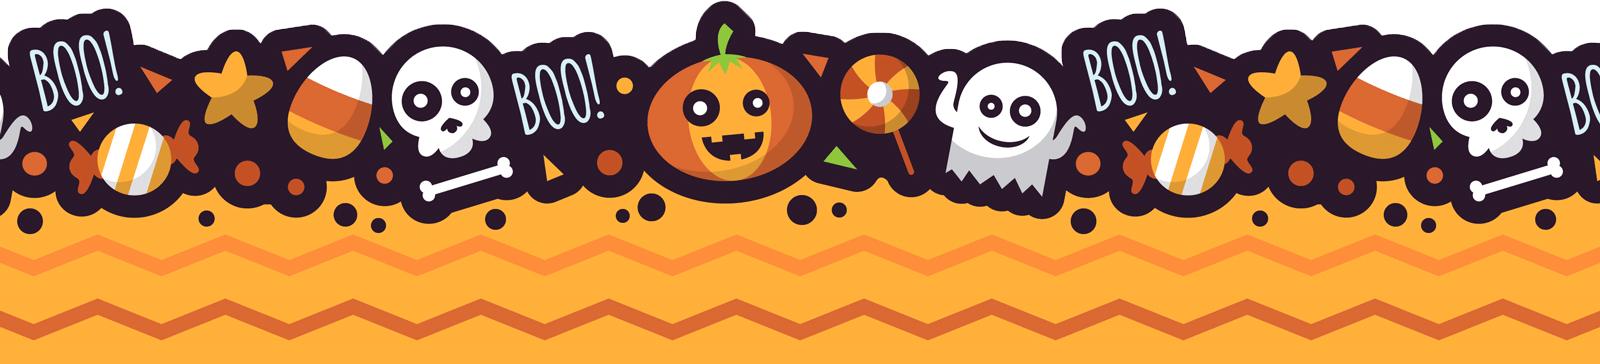 Clipart halloween preschool. Border bottom rev visually